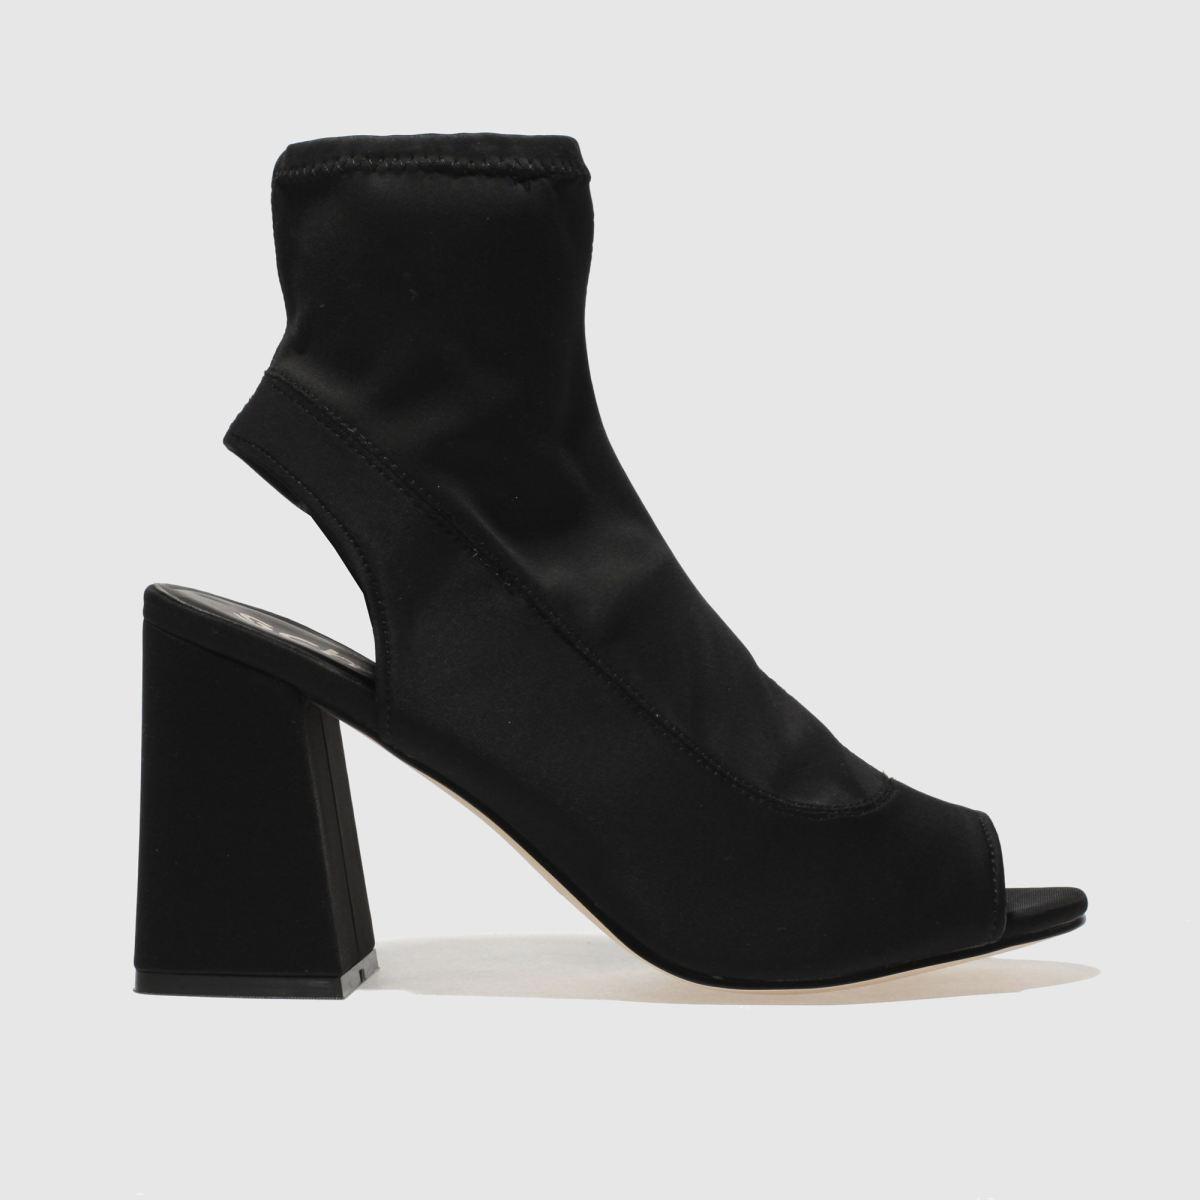 Schuh Black Swish Boots